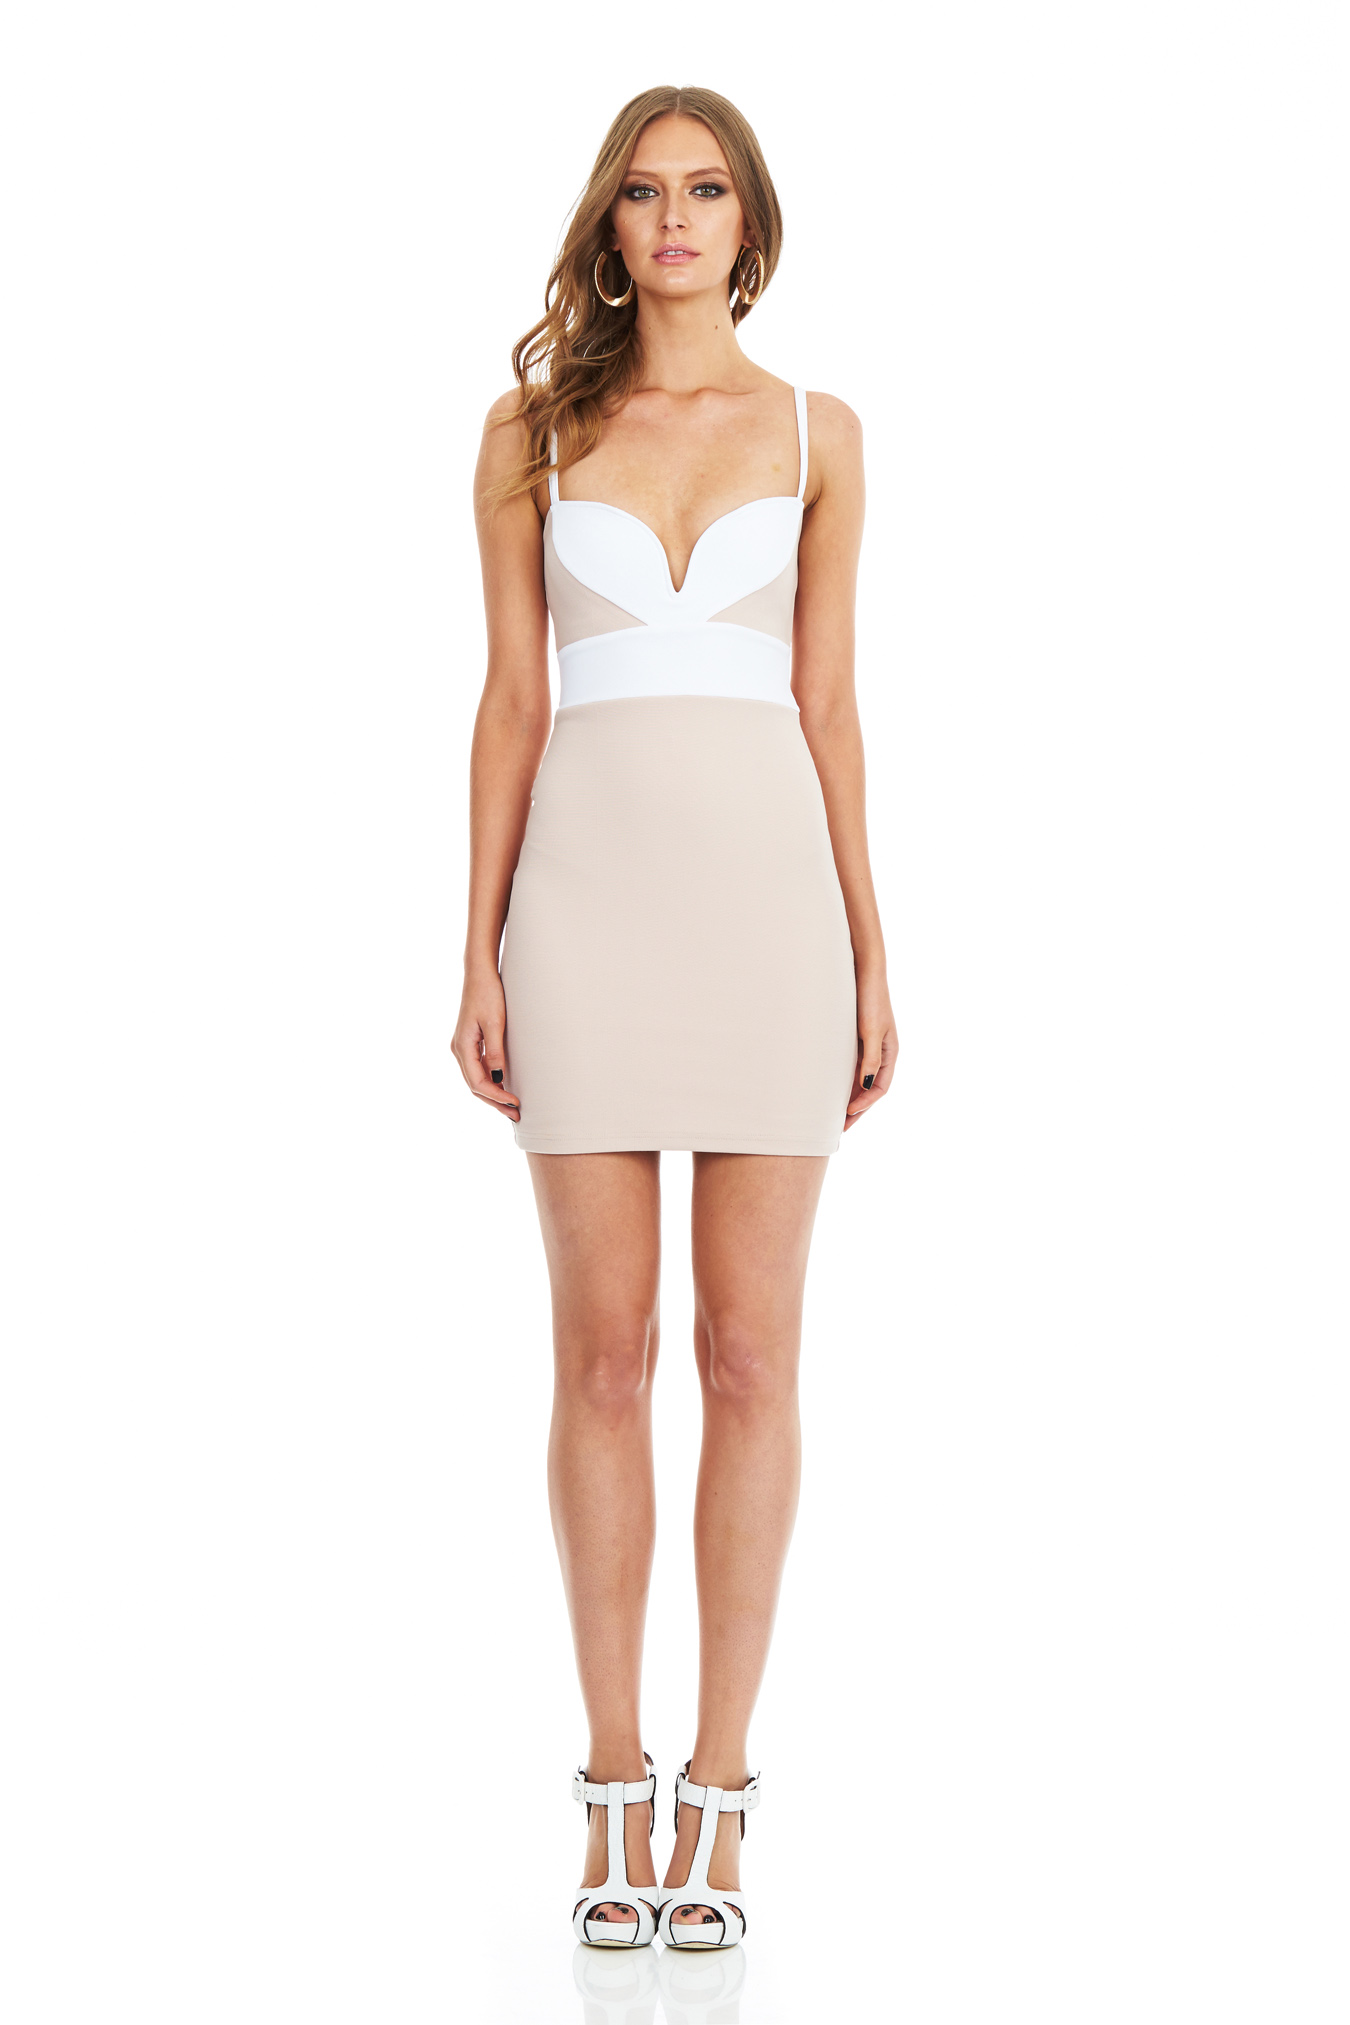 Nude/White Bonita Body Con Dress : Buy Designer Dresses Online at Nookie